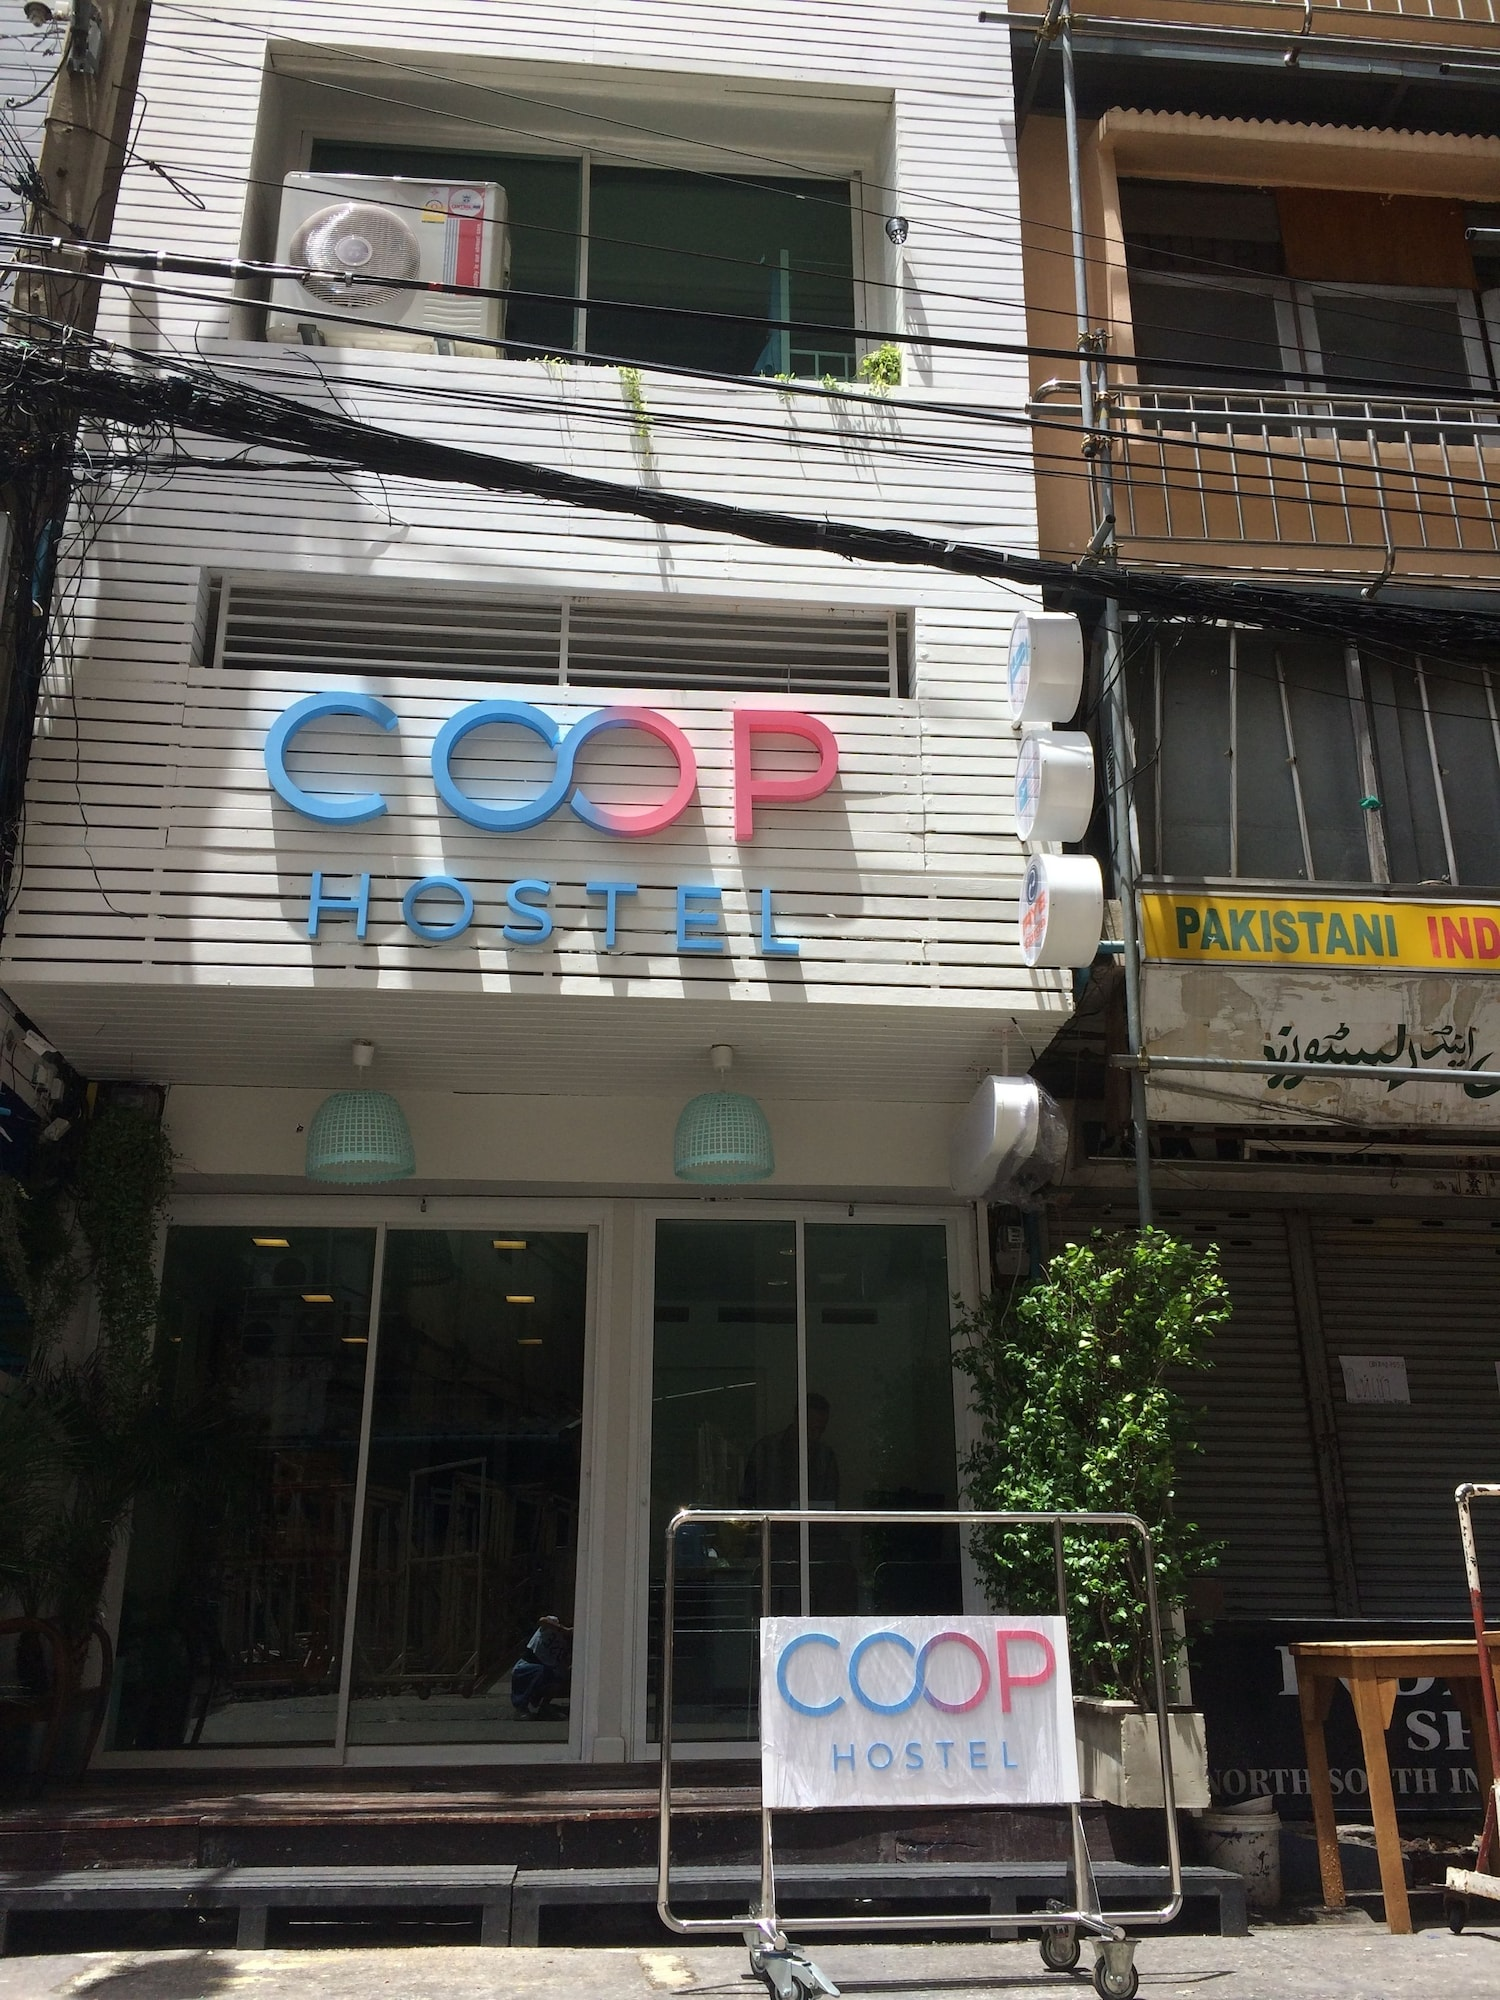 Coop Hostel, Ratchathewi